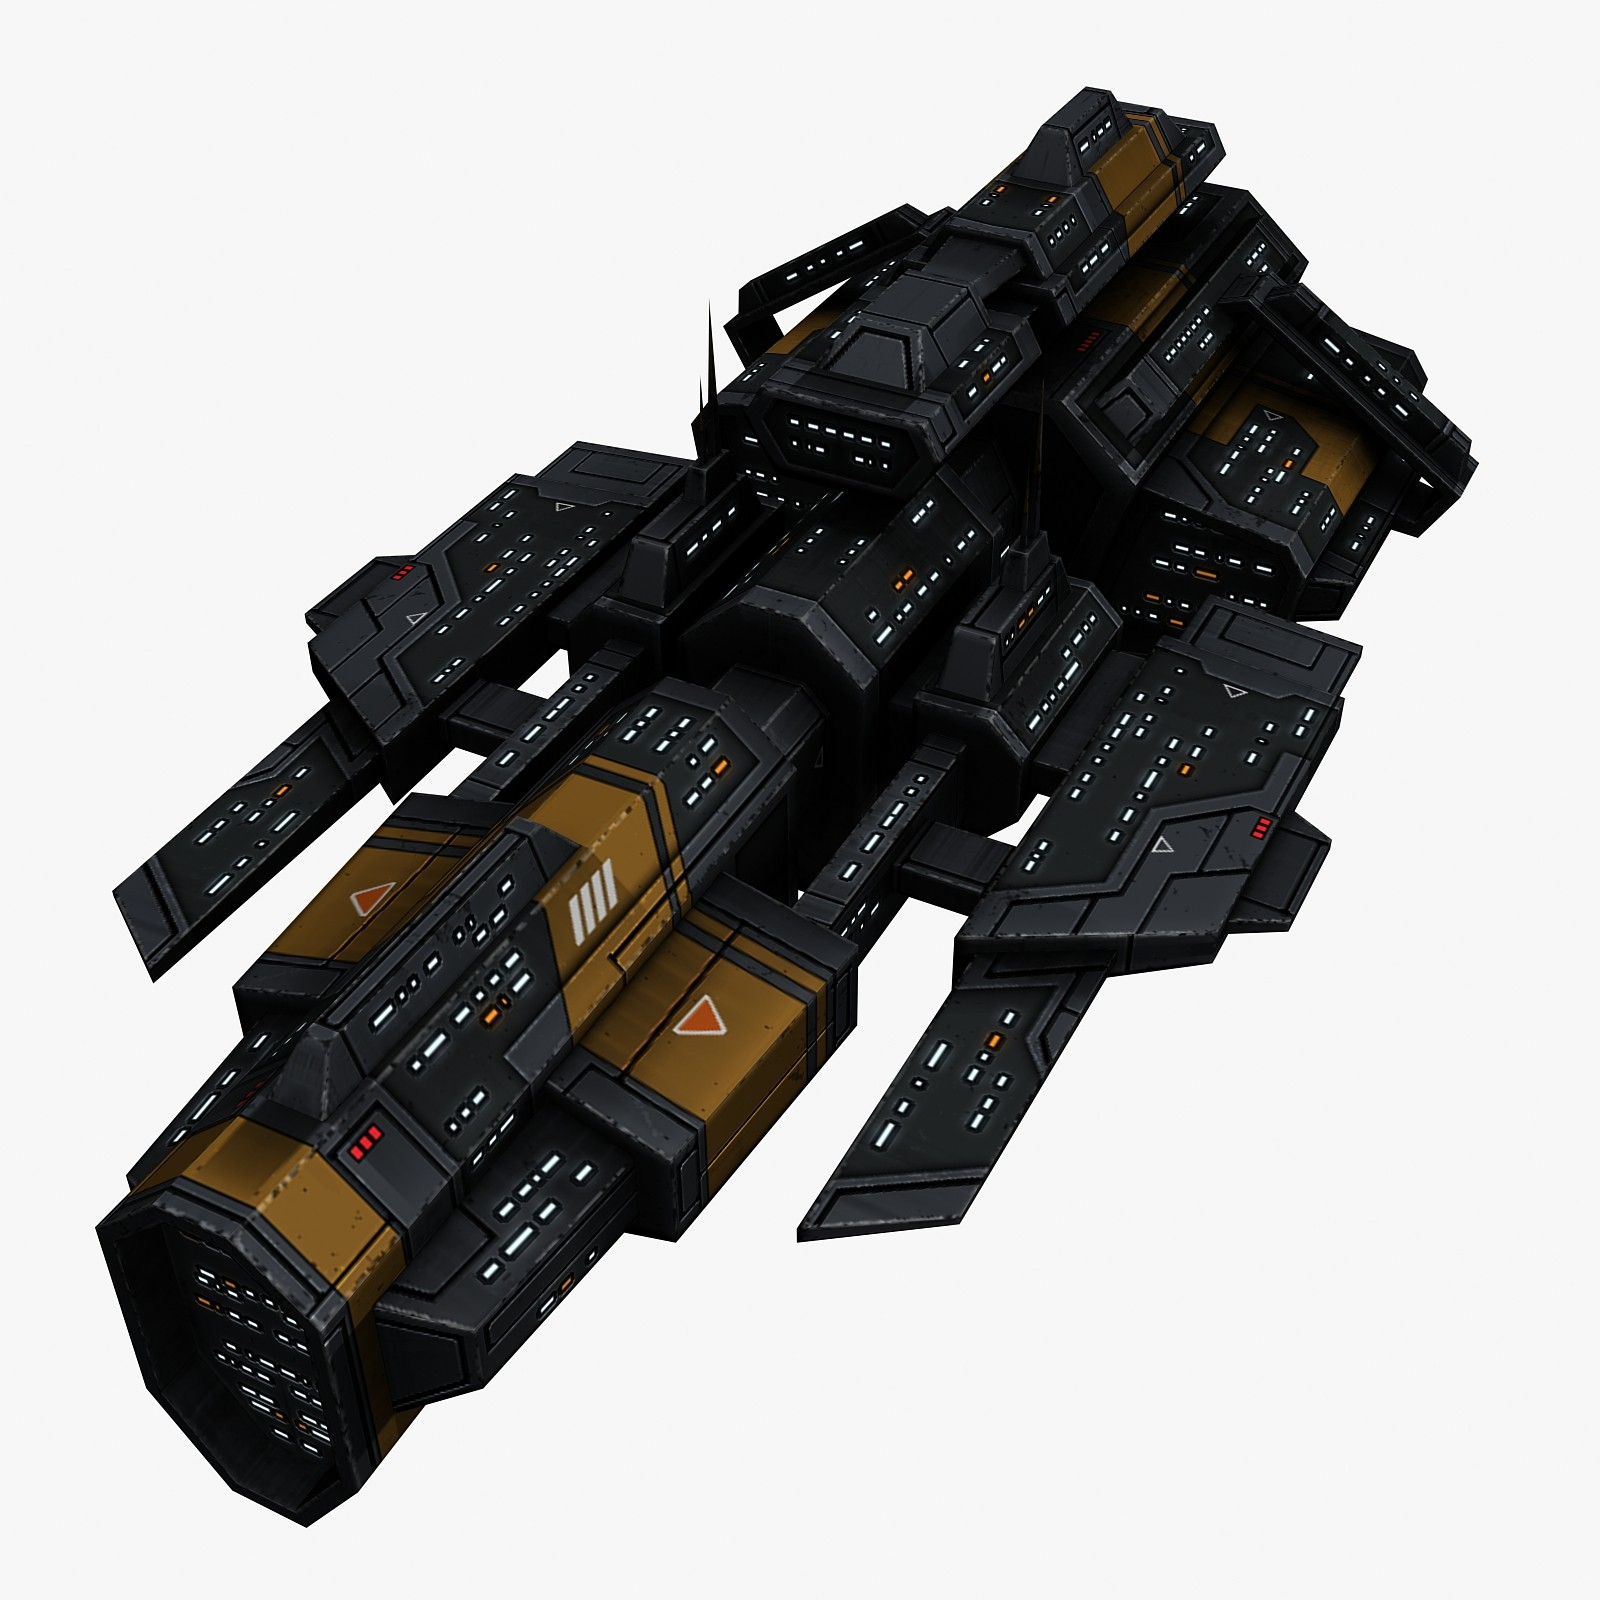 space_battleship_3_preview_1.jpg